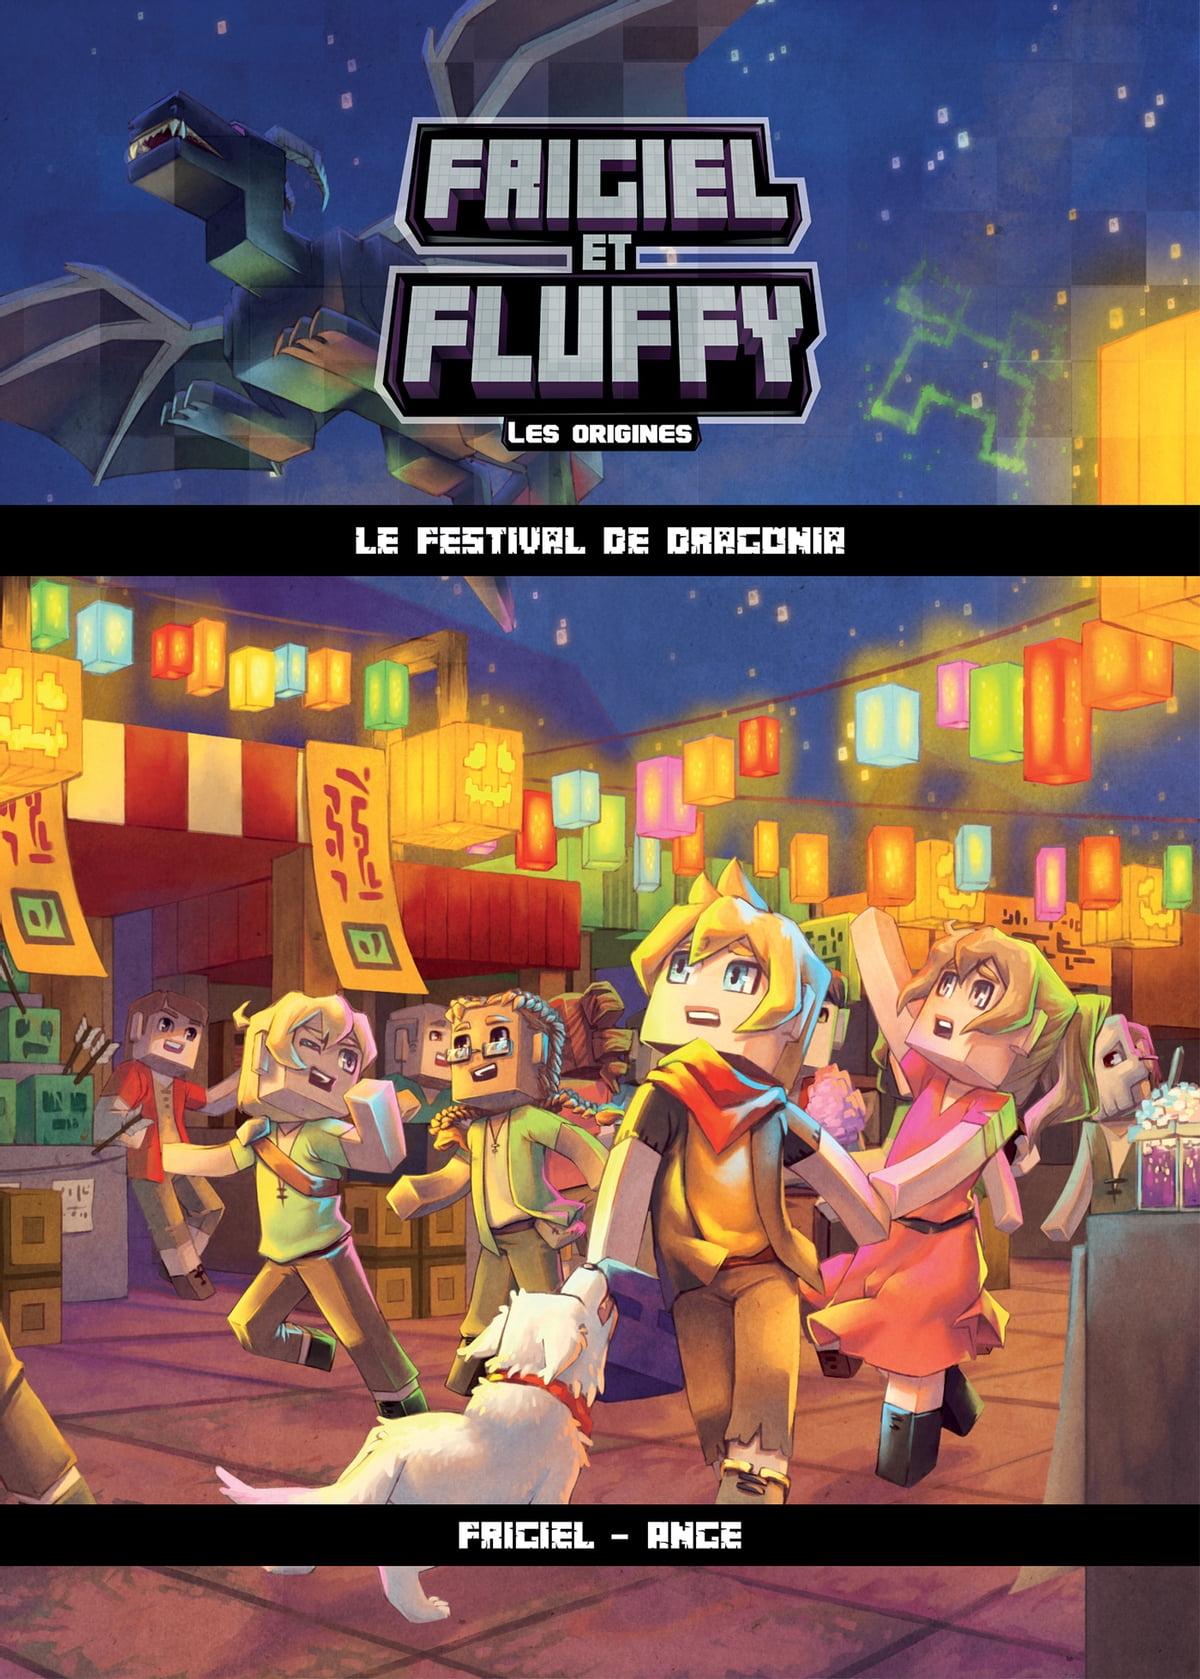 Vidéo De Frigiel Et Fluffy Saison 4 : vidéo, frigiel, fluffy, saison, Frigiel, Fluffy,, Origines, Festival, Dragonia, Lecture, Roman, Jeunesse, Aventures, Minecraft, Rakuten, Zealand